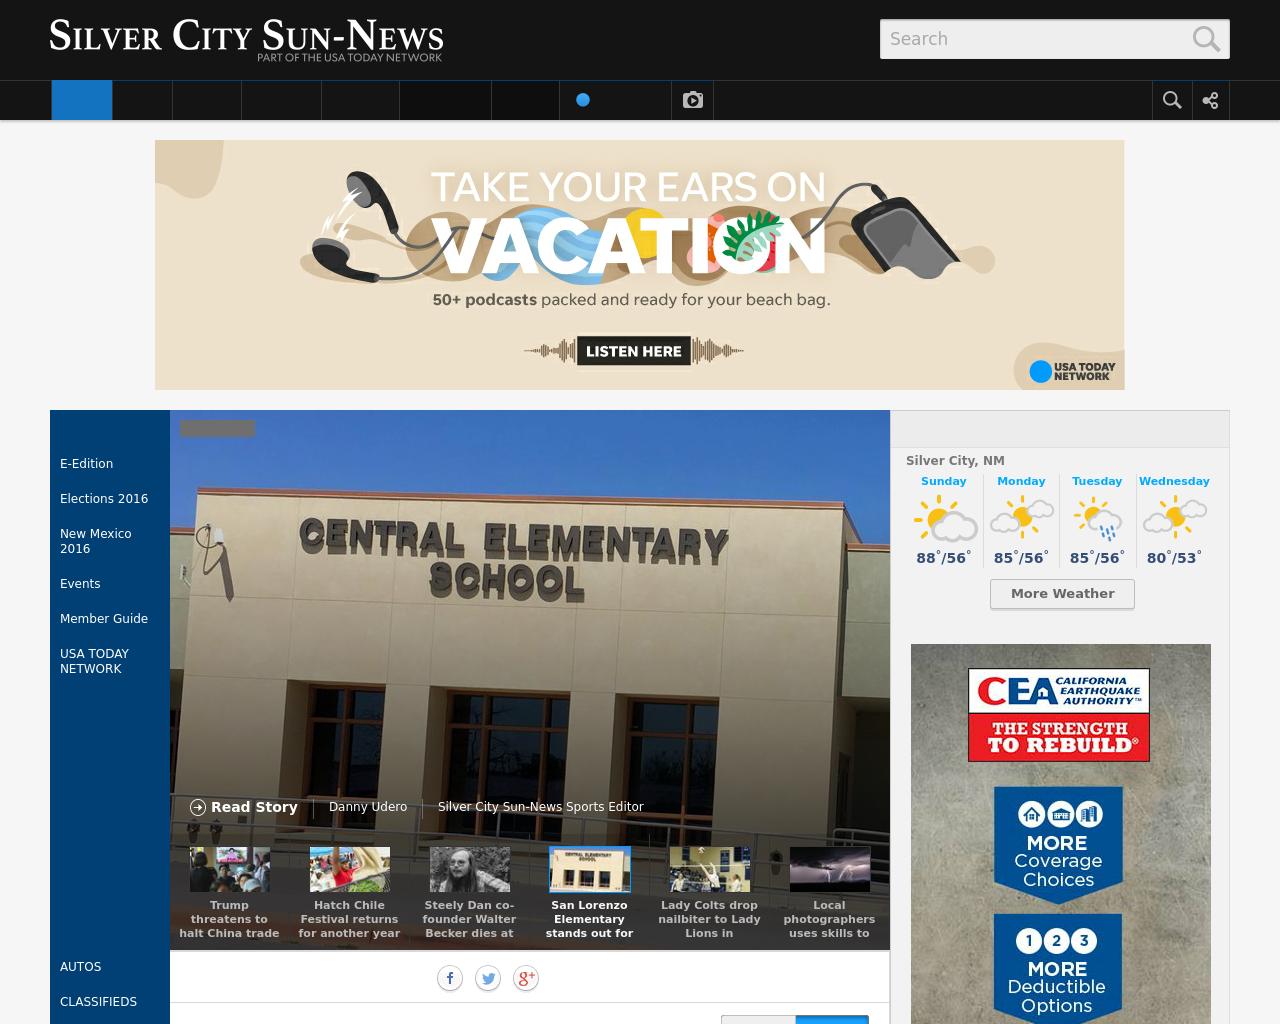 Silver-City-Sun-News-Advertising-Reviews-Pricing